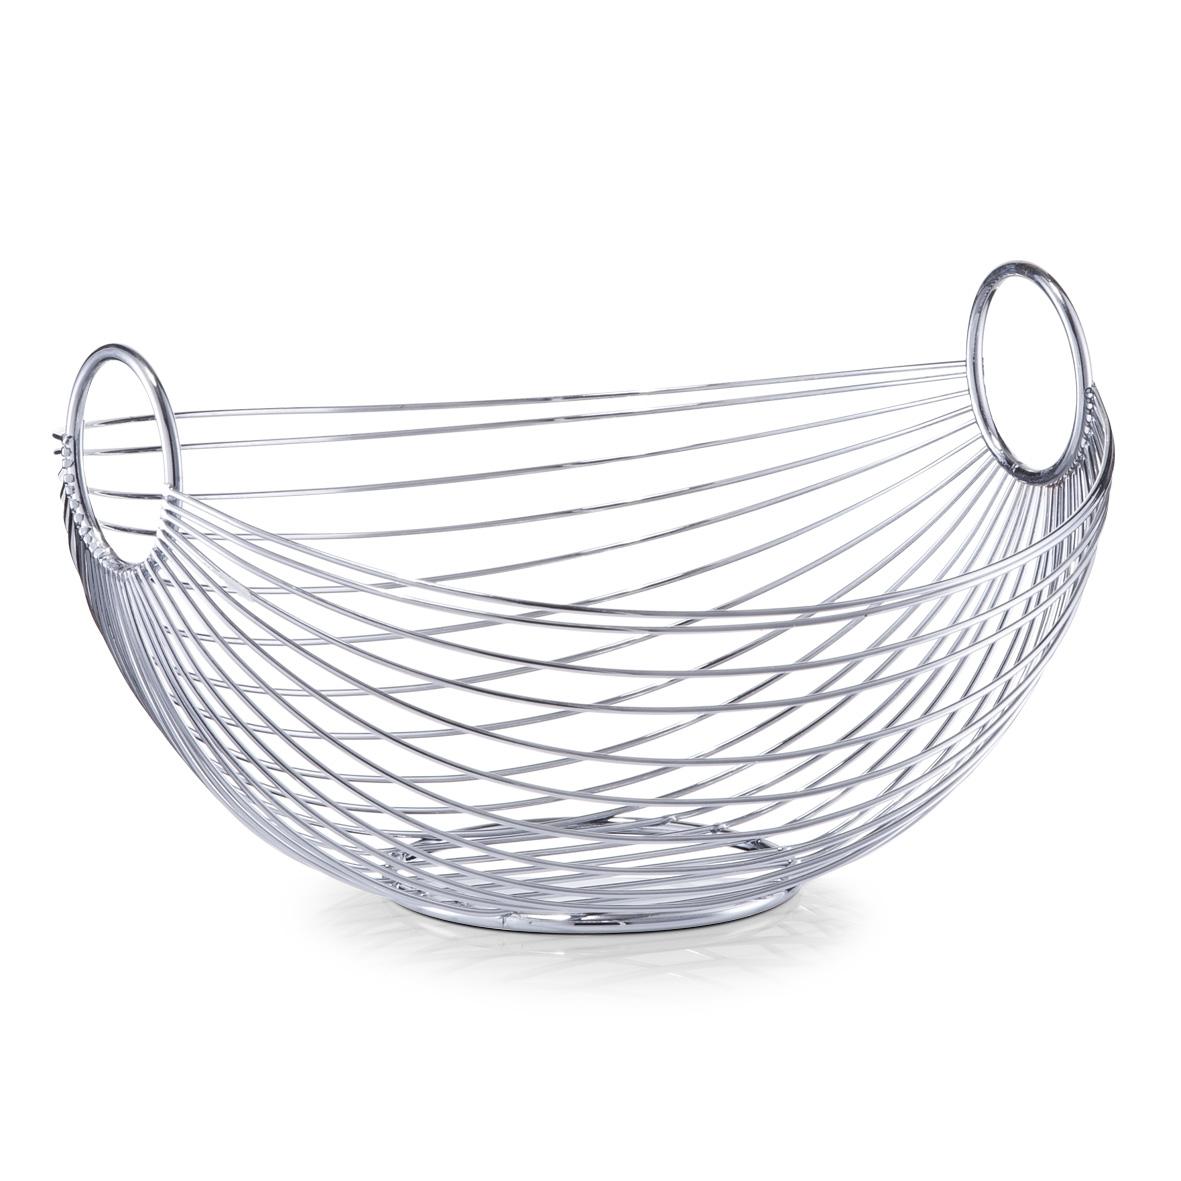 Fructiera Bowl, Metal Cromat, l28xA25,5xH16 cm poza